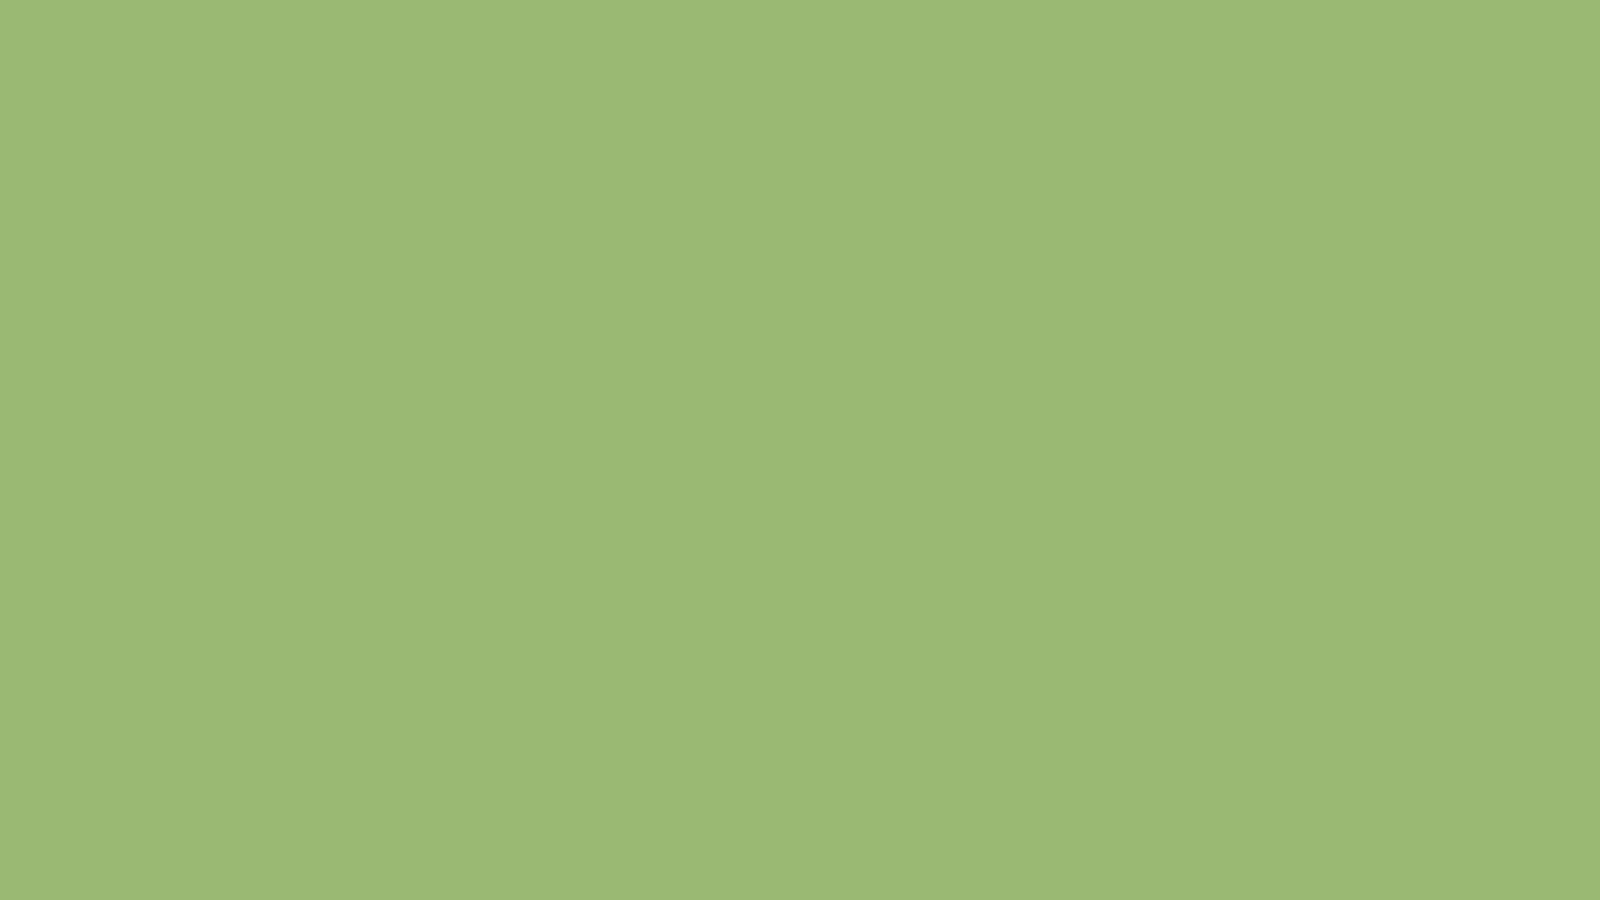 1600x900 Olivine Solid Color Background